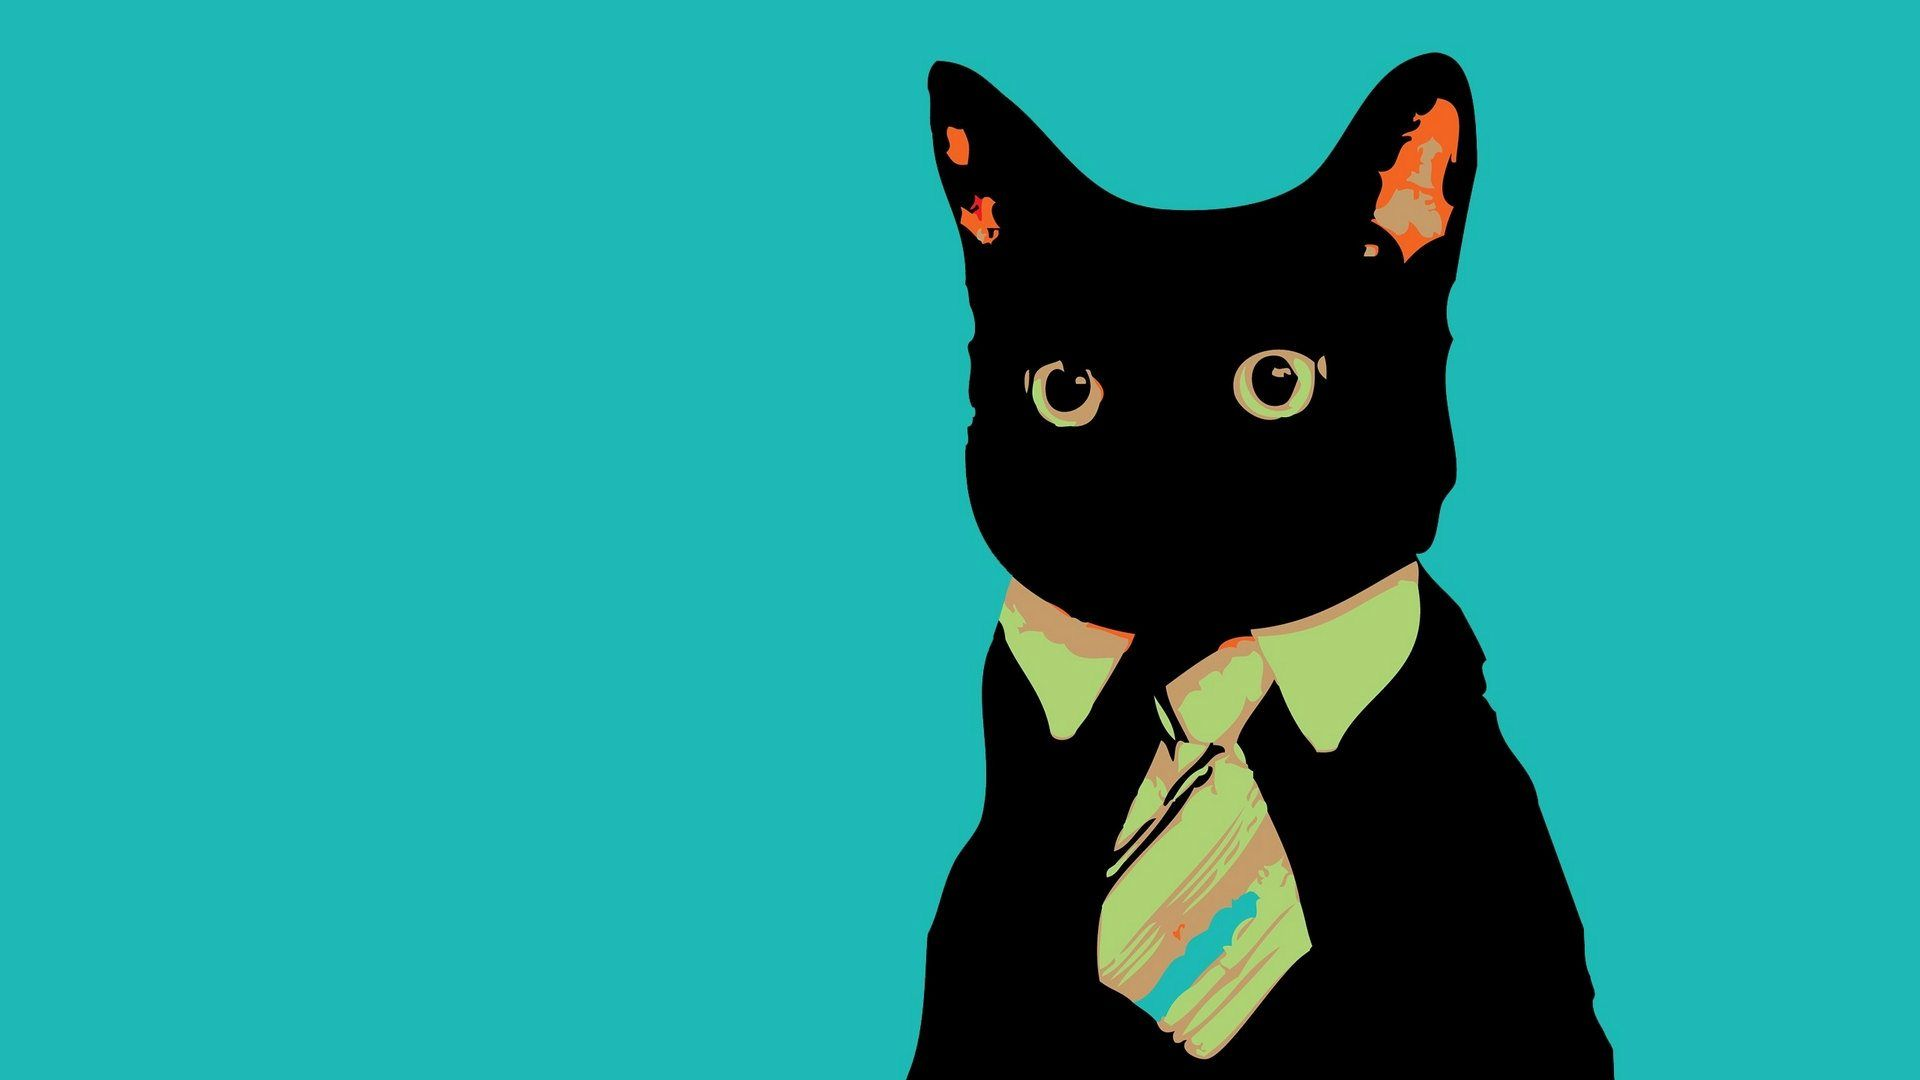 Cat Artwork Black Cat Art Hd Desktop Backgrounds Wallpapers